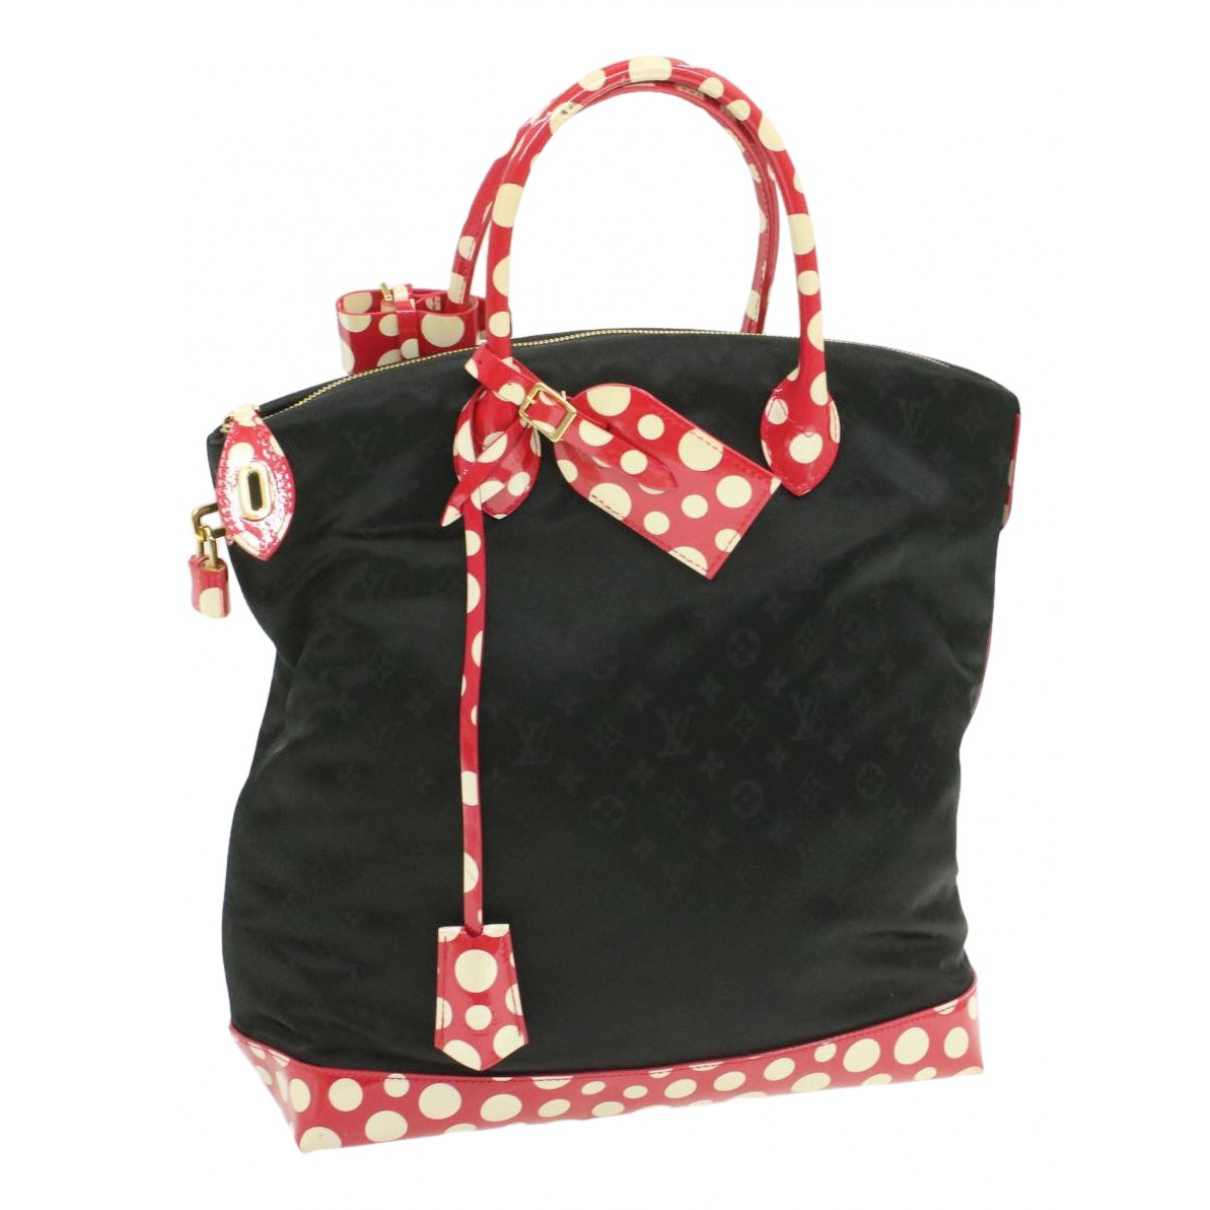 Louis Vuitton Lockit Black handbag for Women N